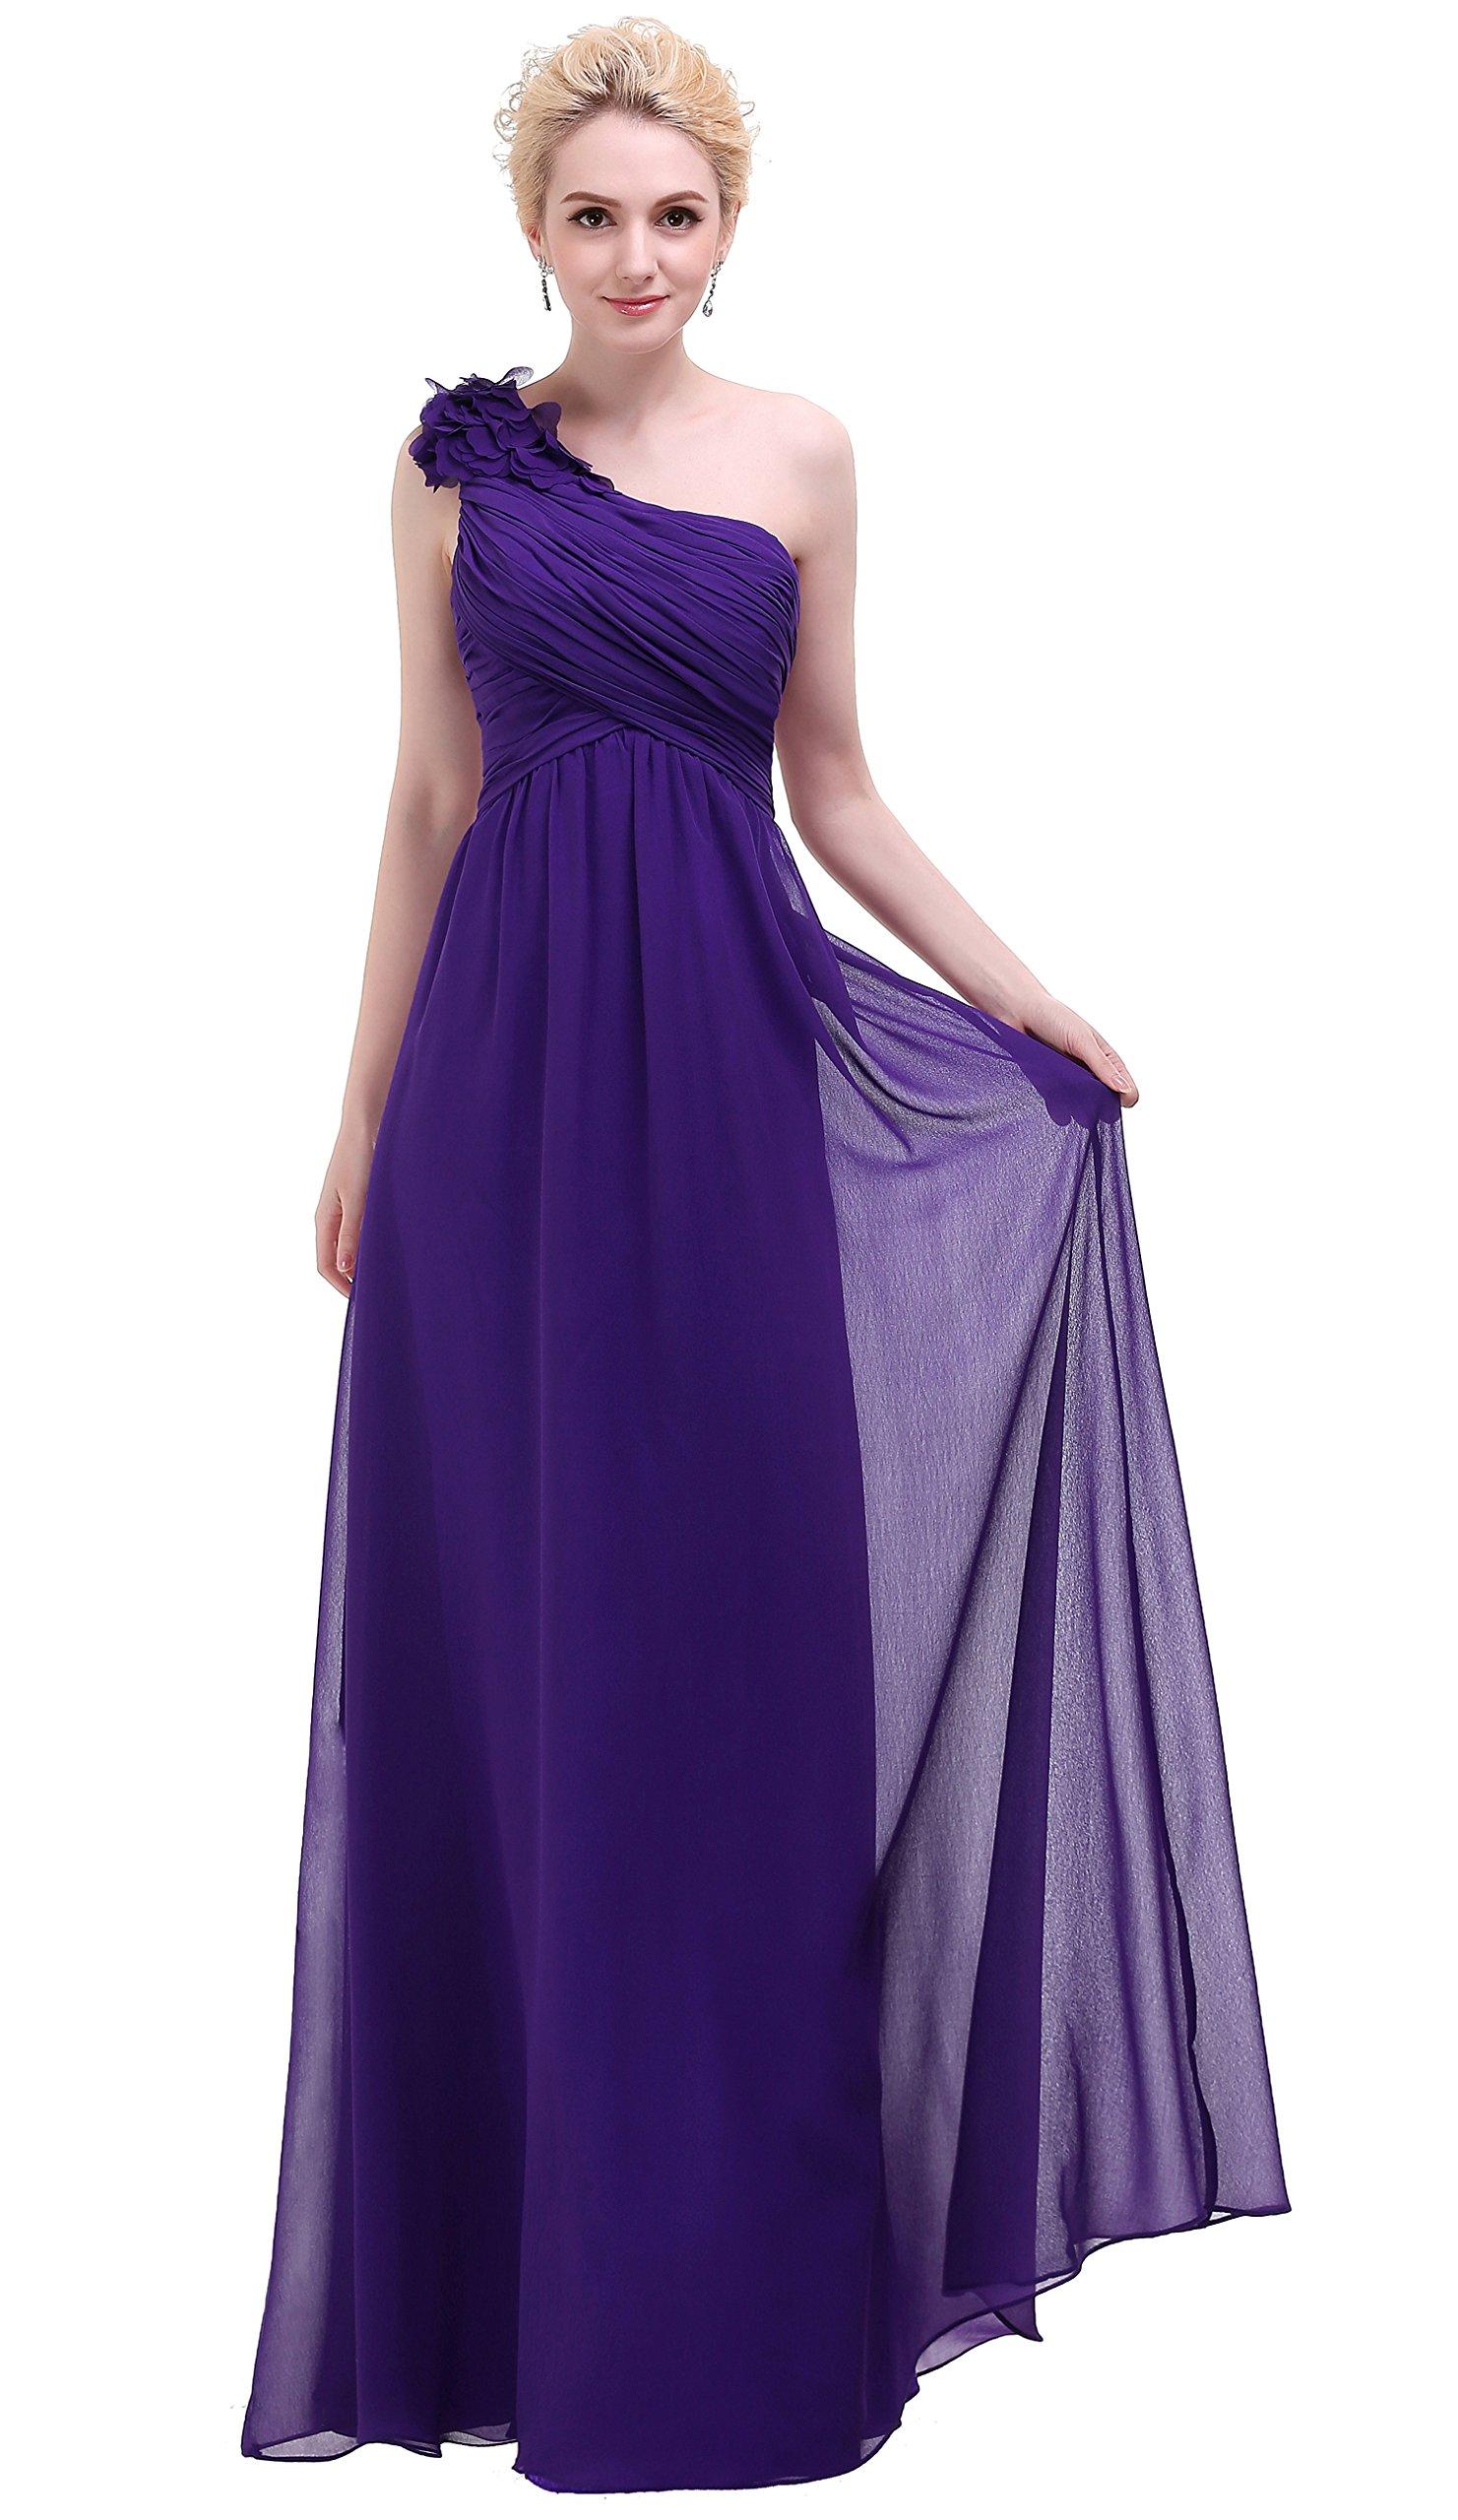 Bislu Flowers One Shoulder Long Prom Party Bridesmaids Dress Dark Purple 14